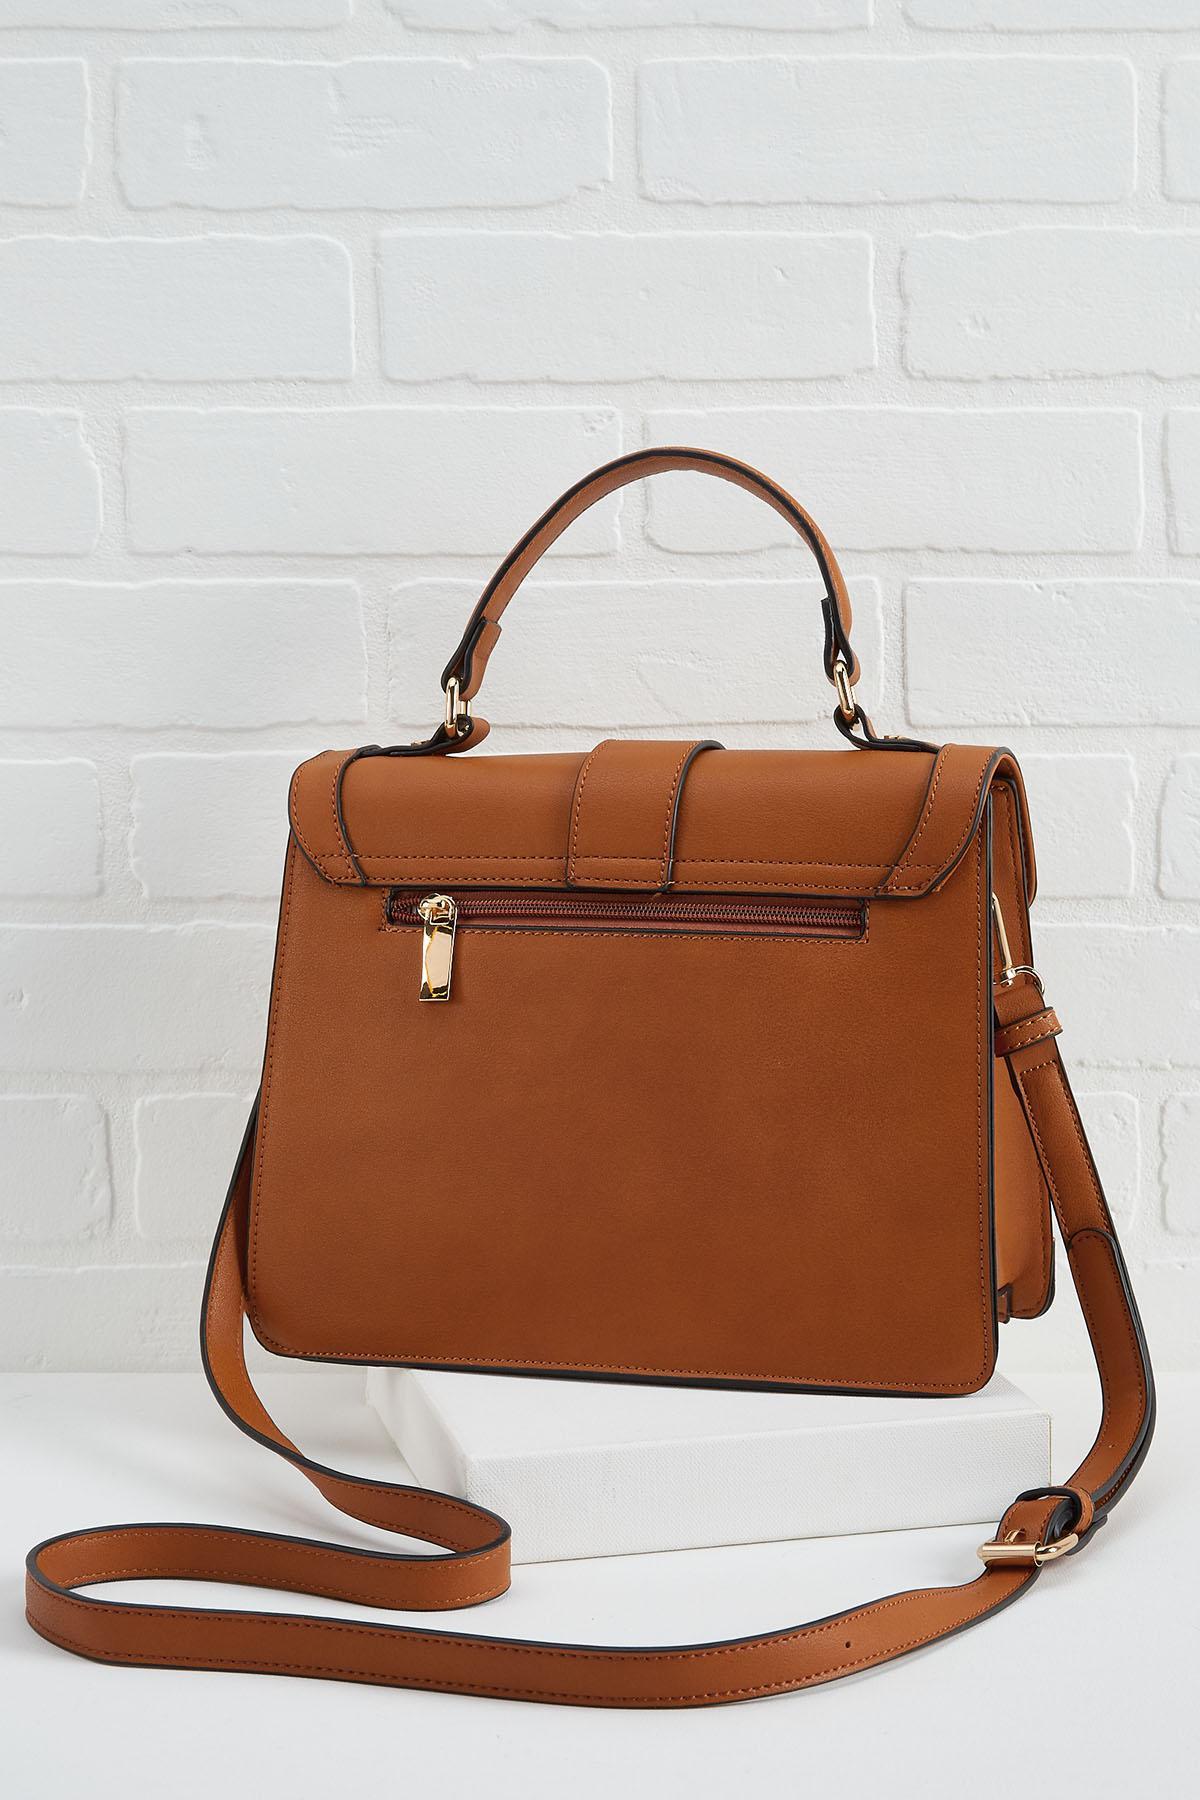 Top Handle The Situation Bag